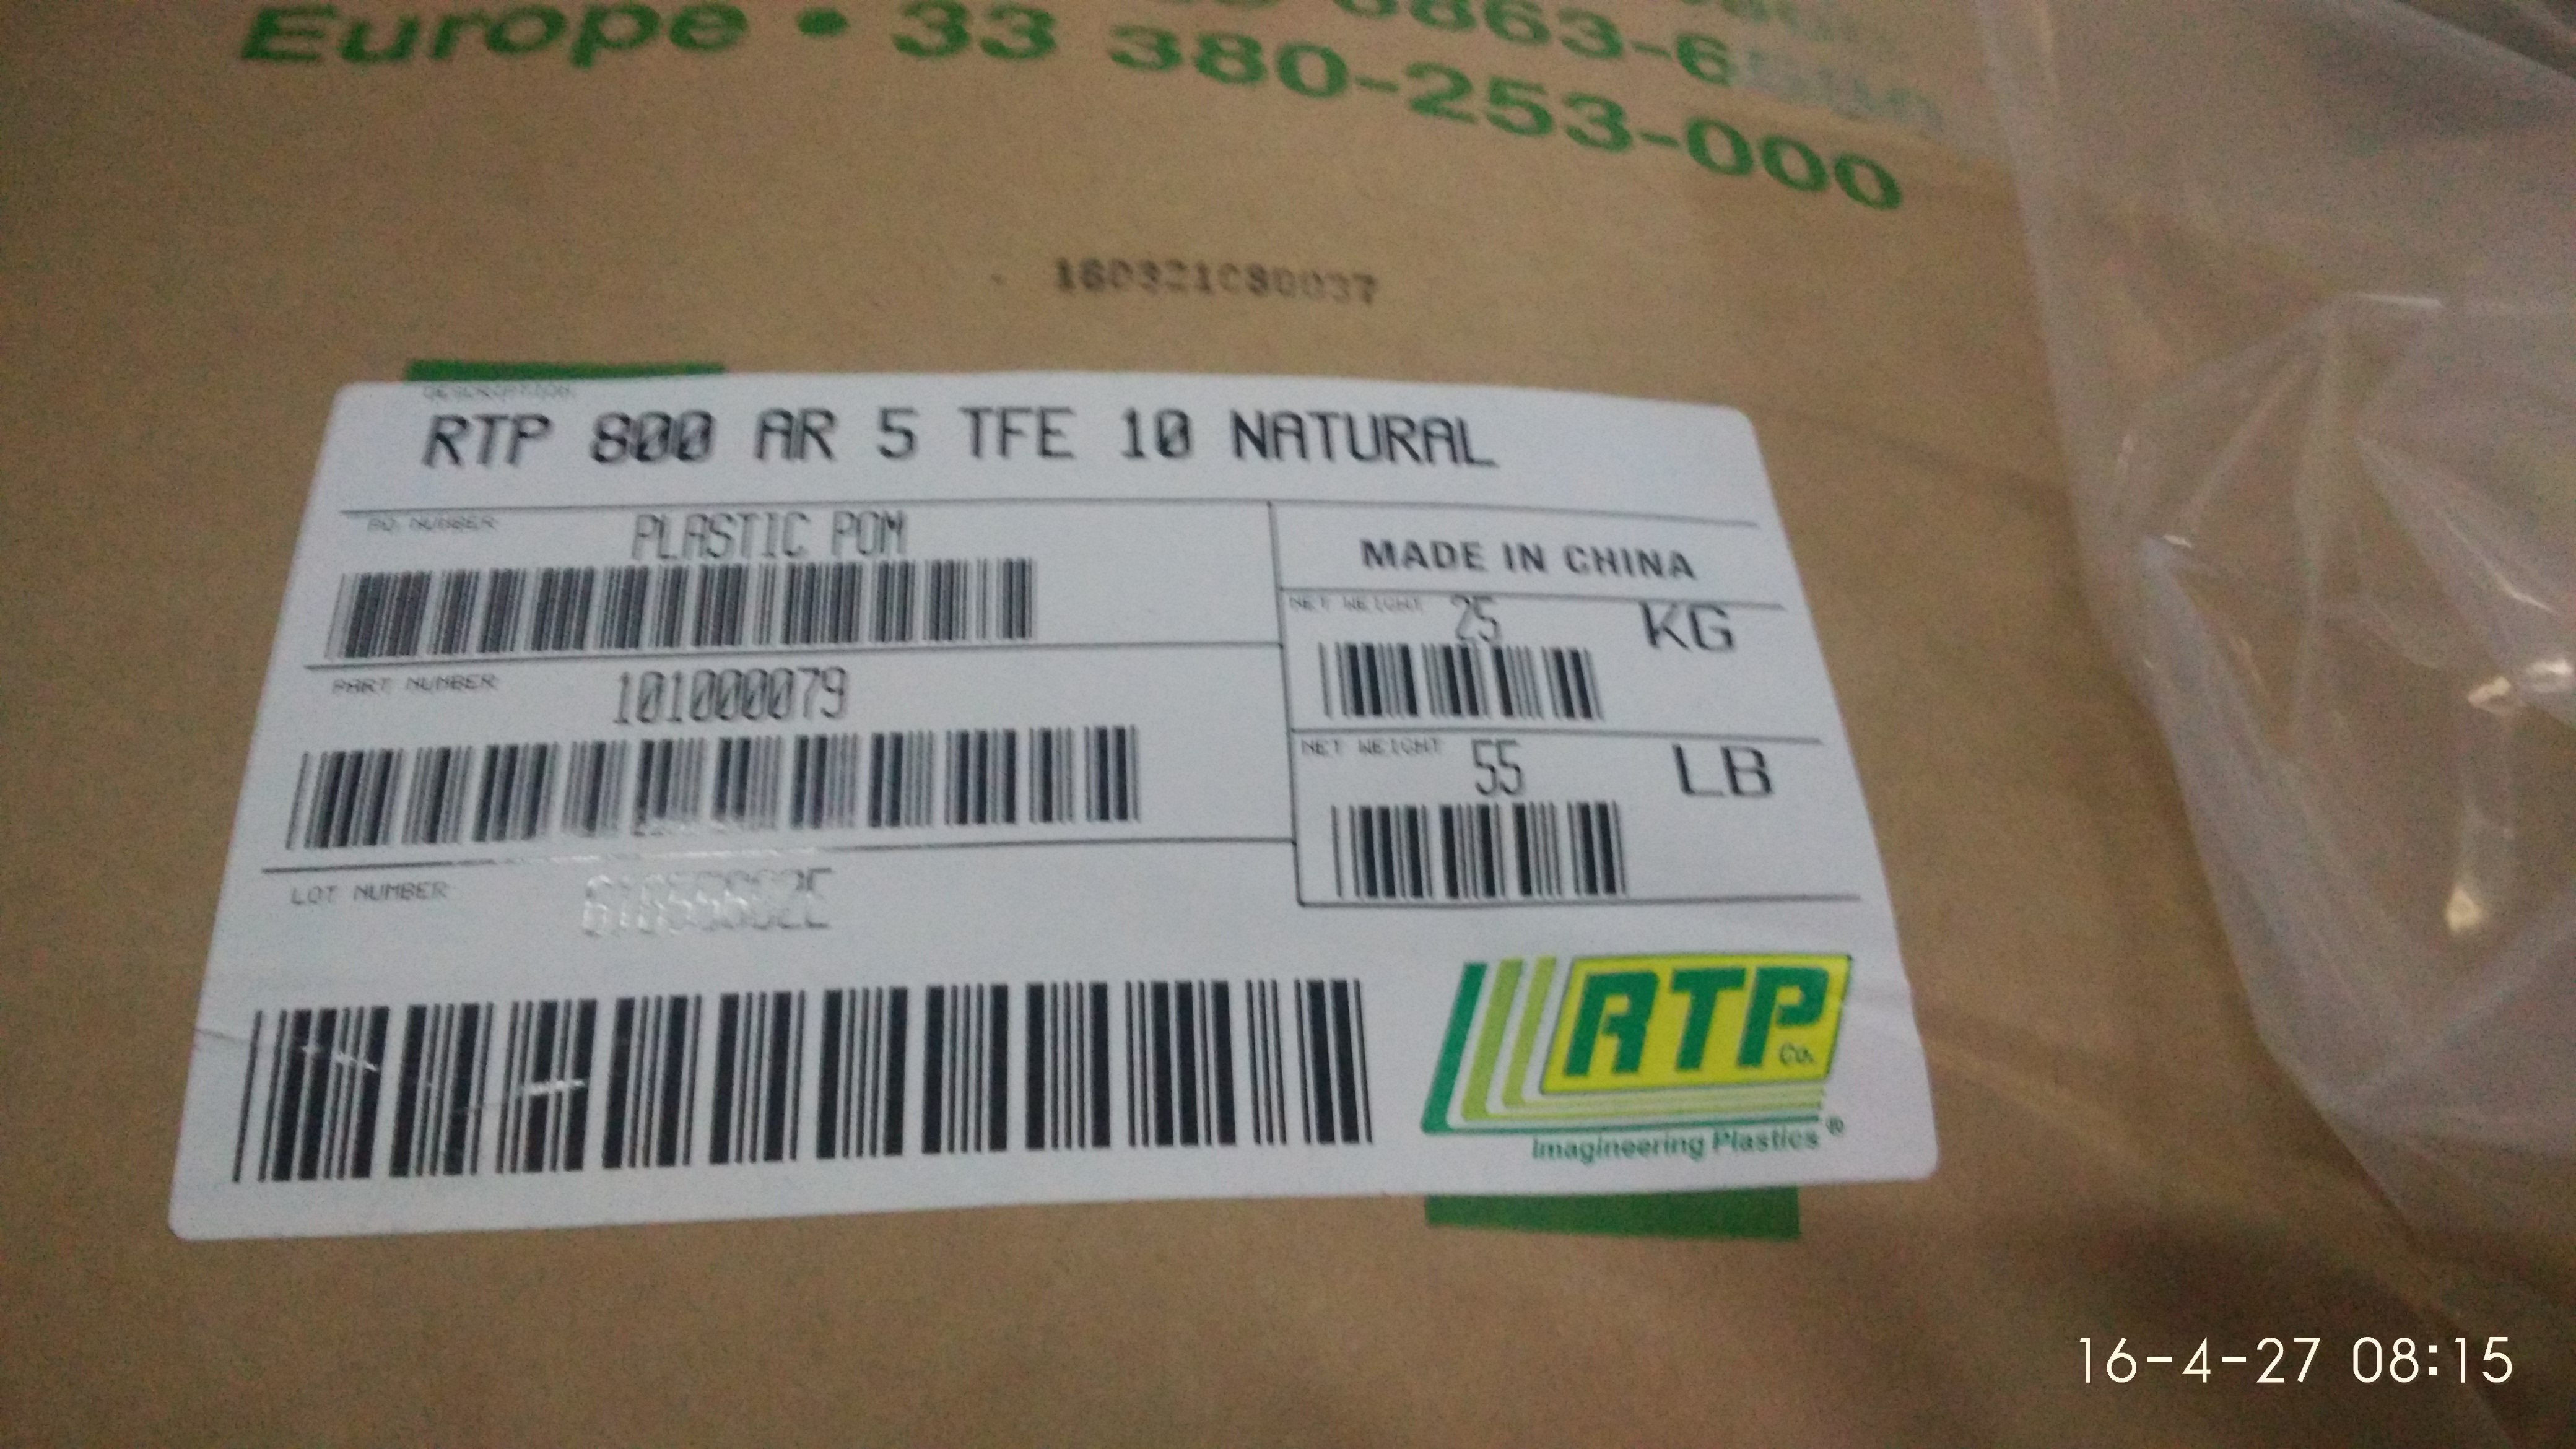 RTP 899 X 88199PTFE 润滑-硅润滑- UL94 HB